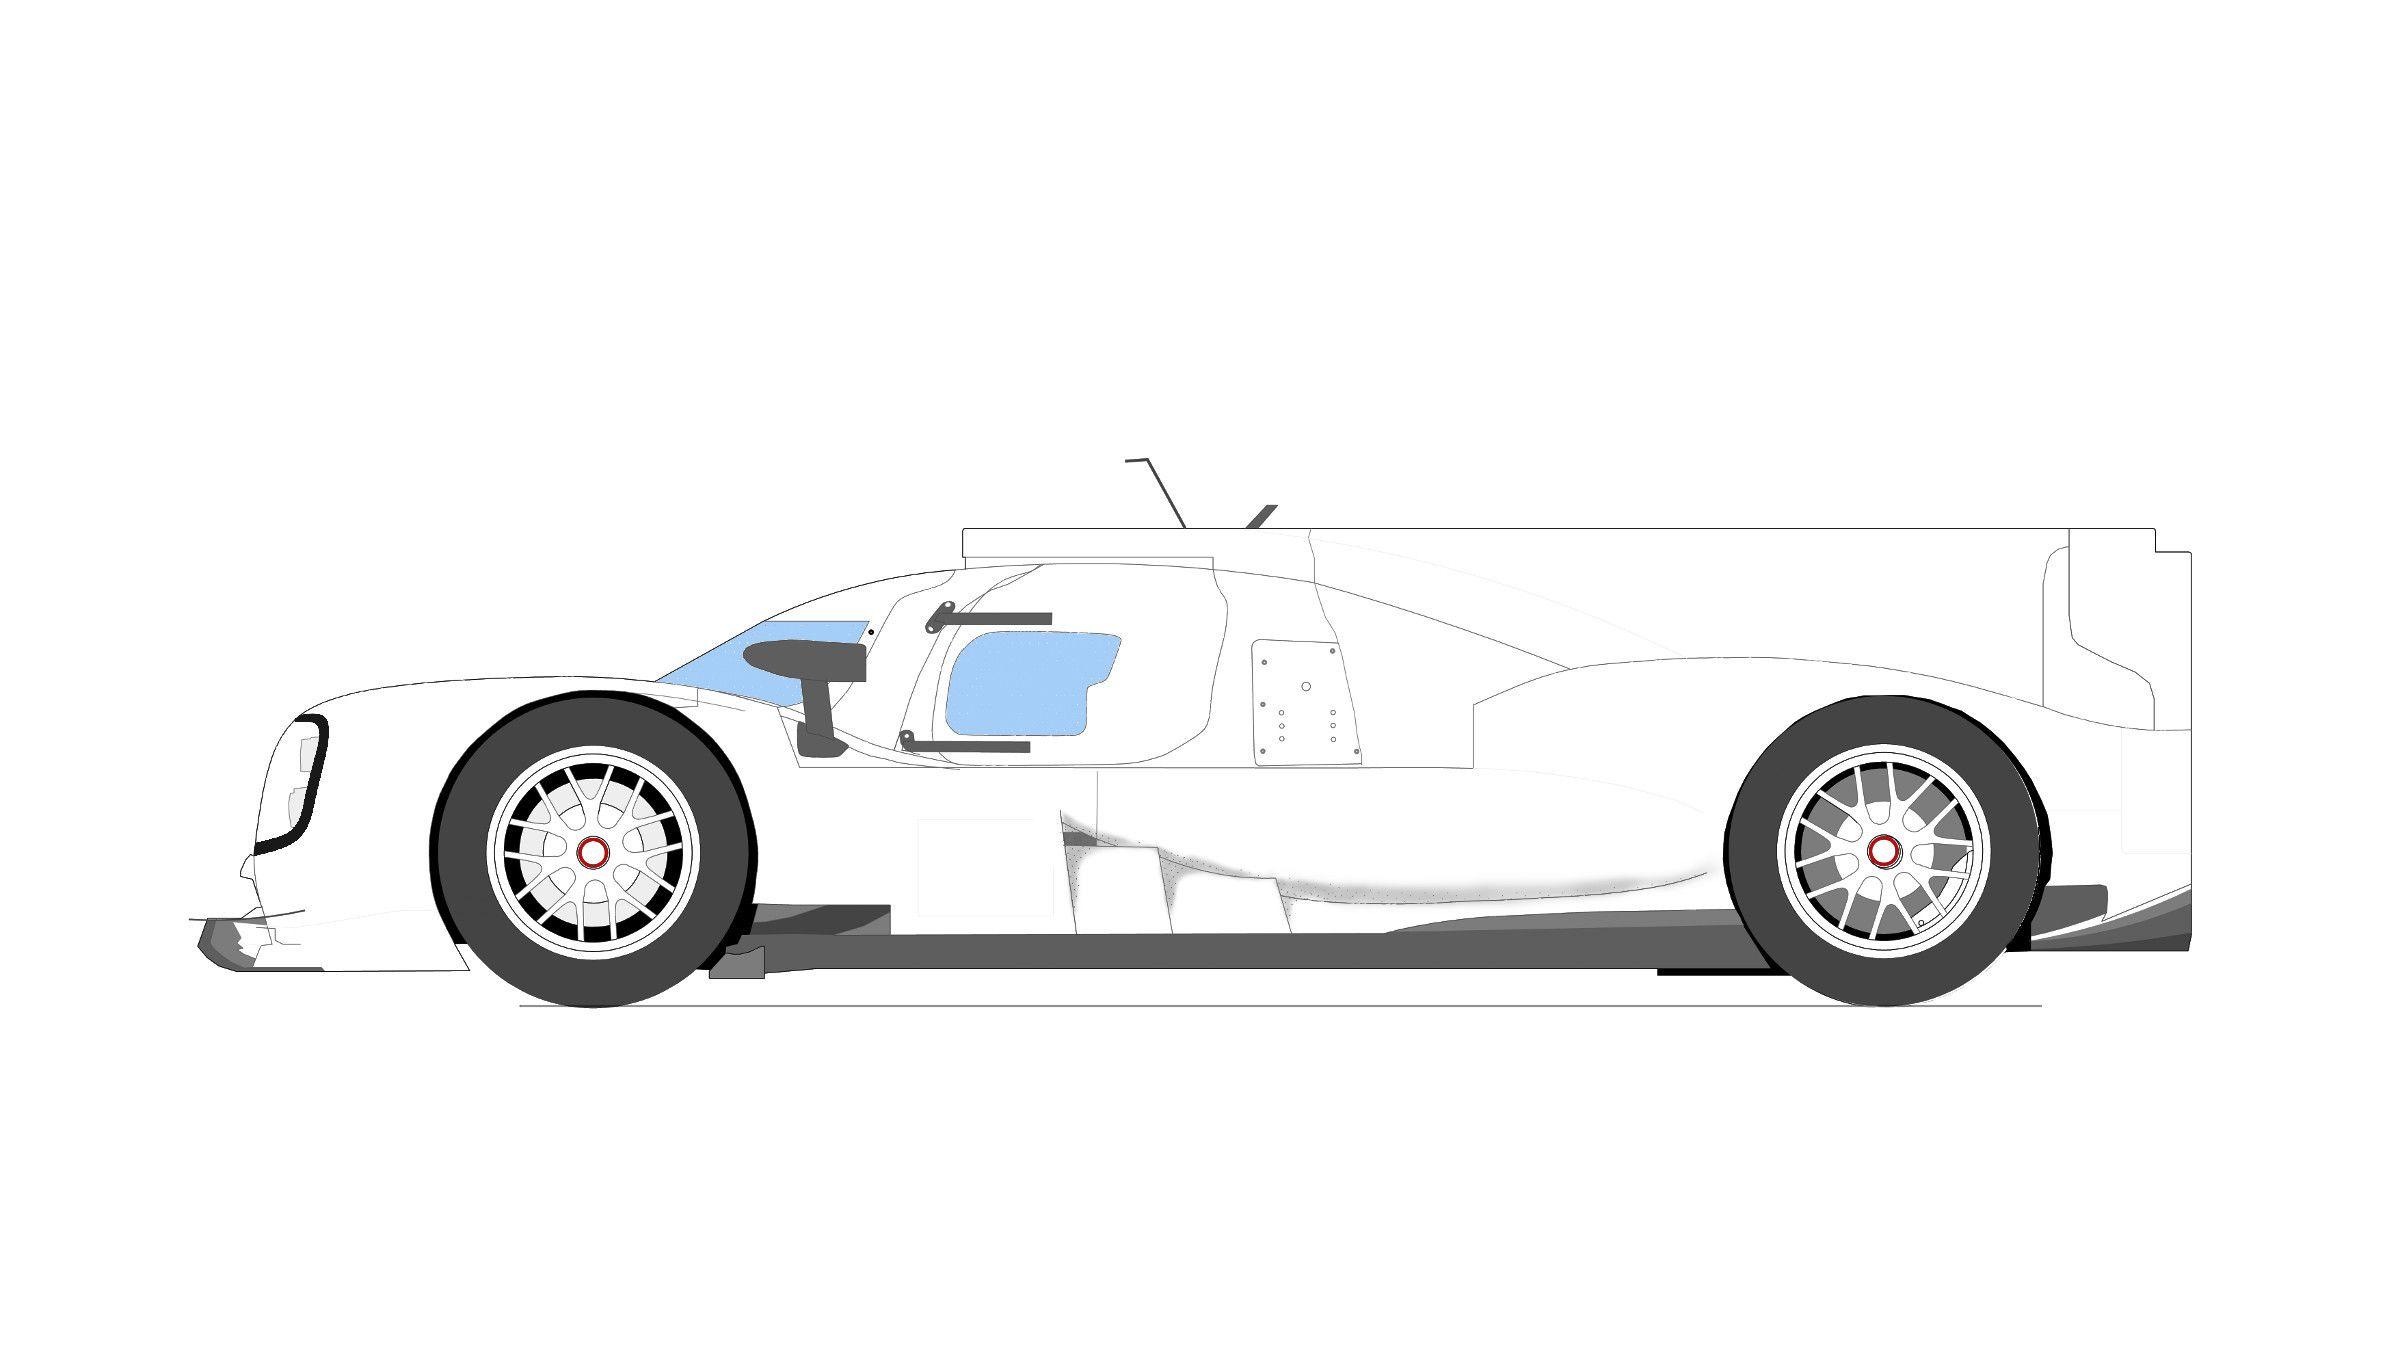 #Porsche919; #LMP1; #Cardrawing